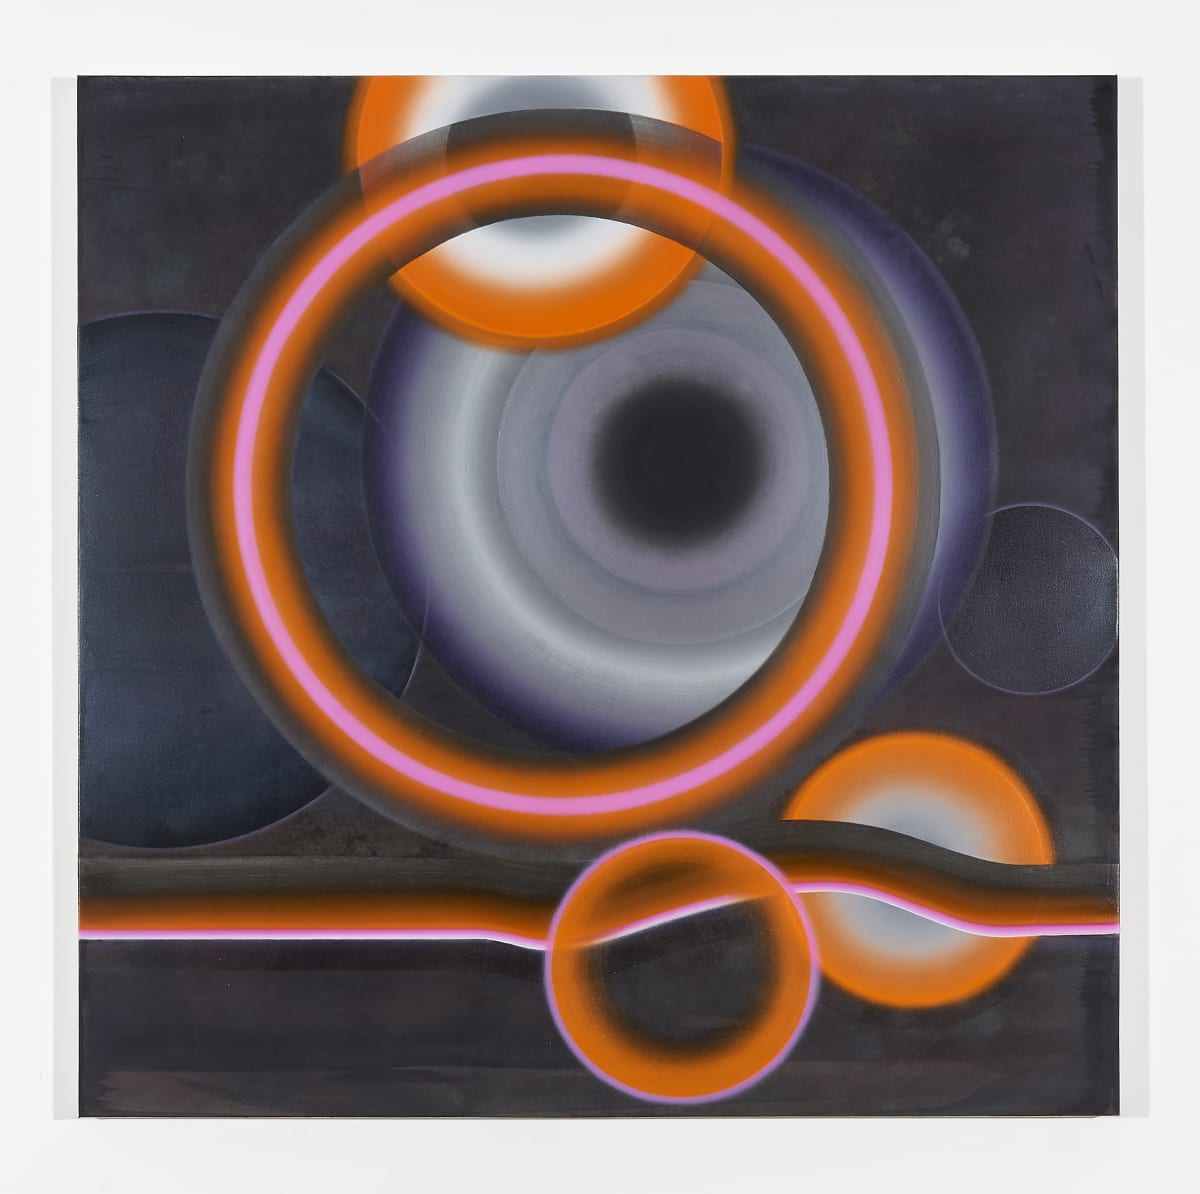 Marion Borgelt Exploding Stars and Orange Giants, 2019 oil, acrylic on canvas 120 x 120 cm